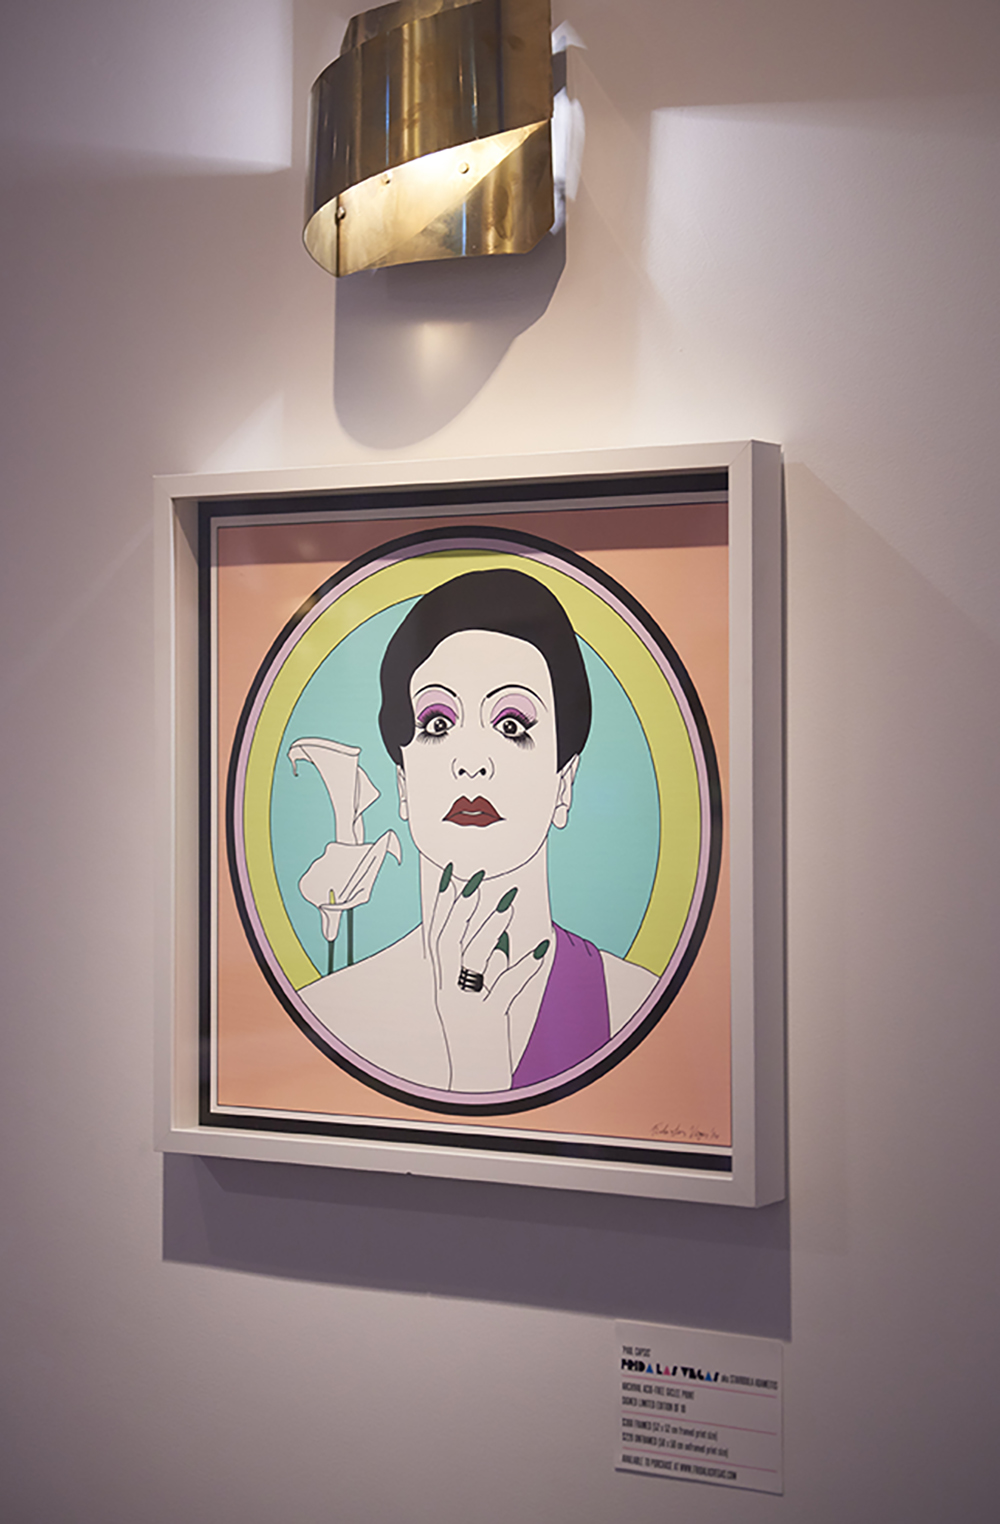 2018-09-06 - Frida Las Vegas at Imperial by Tim da-Rin 4_webdownresed.jpg